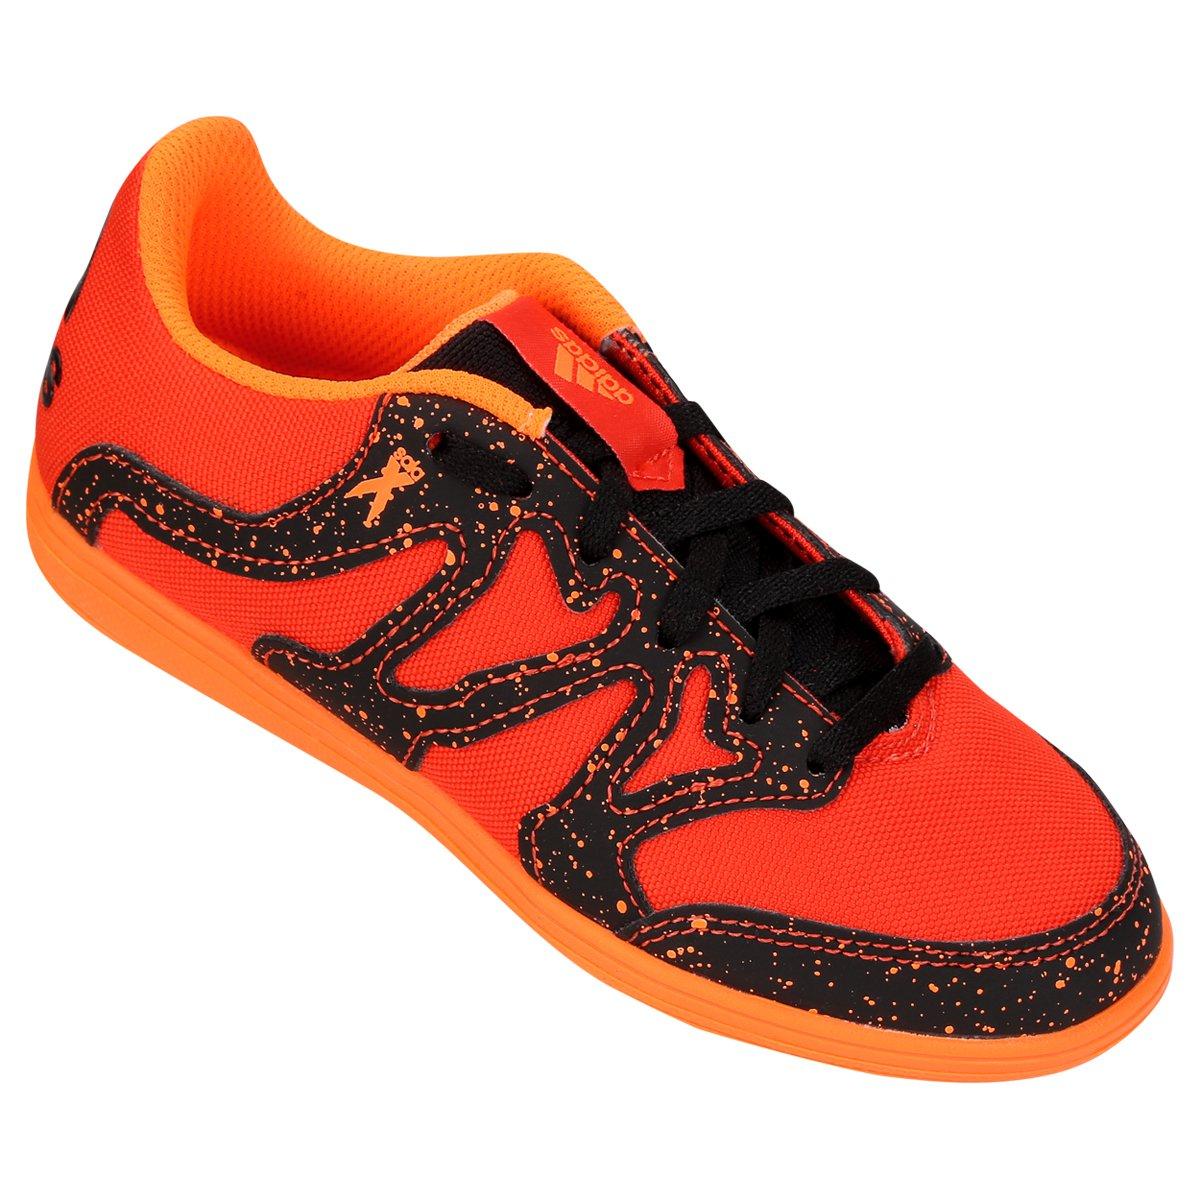 Chuteira Adidas X 15.4 Street Futsal Juvenil - Compre Agora  b3725ed75901f